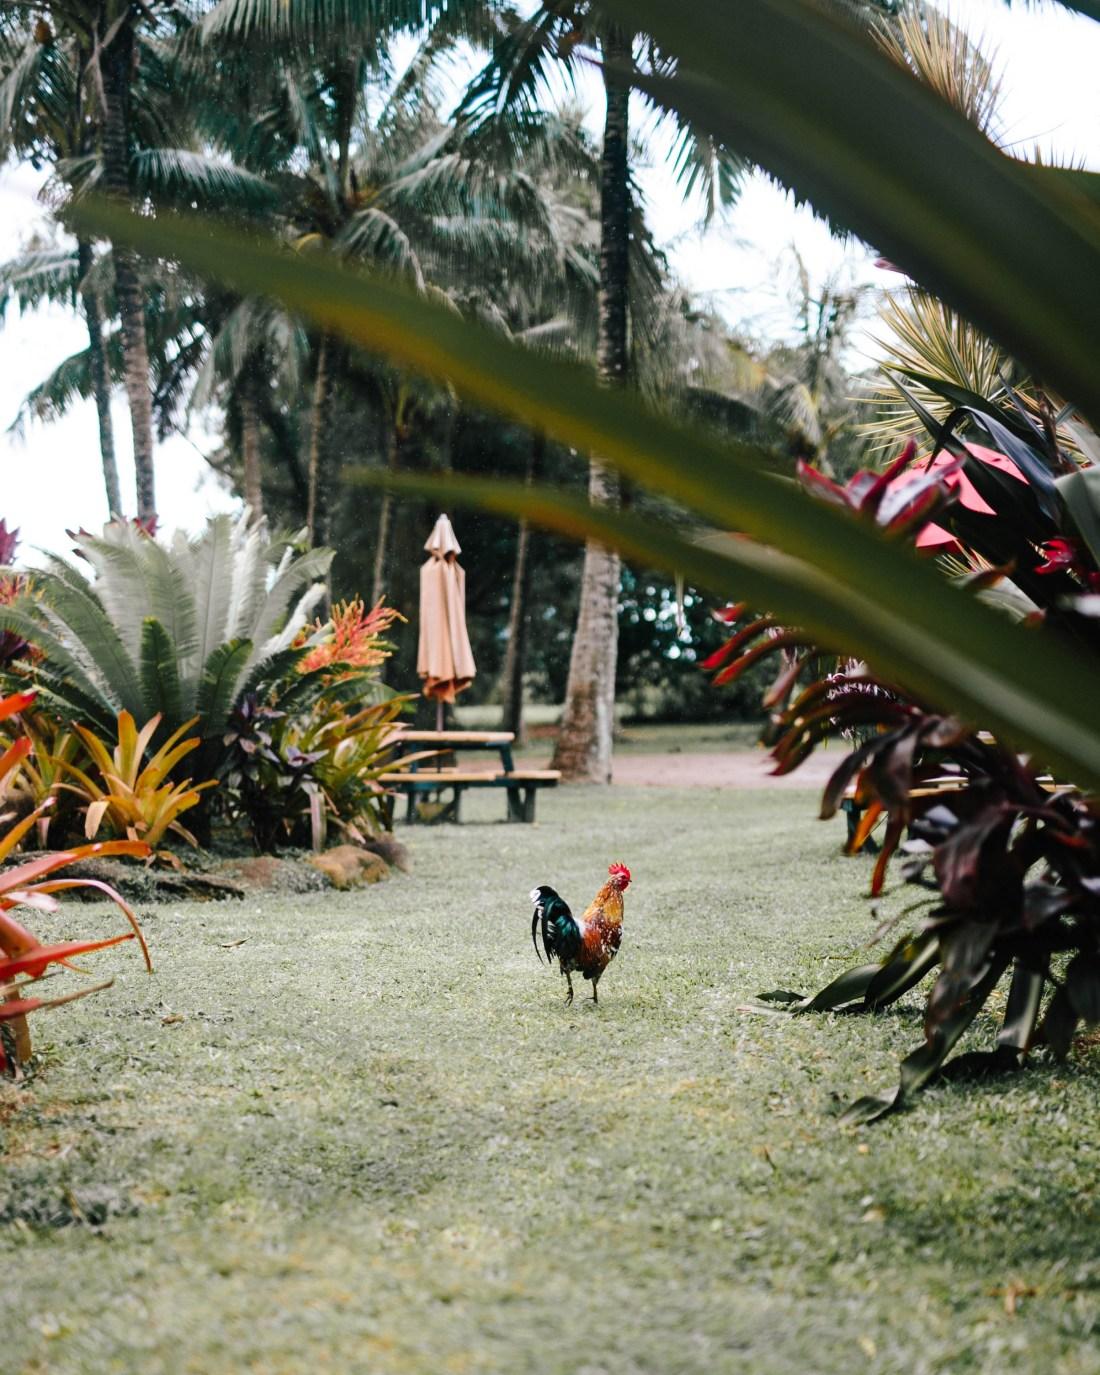 Kauai Bed + Breakfast | Places to Stay in Kauai | The Palmwood | A Curated Lodging Experience | Travel Blogger's Travel Guide to Kauai | Kauai The Chicken Island via @ elanaloo + elanaloo.com